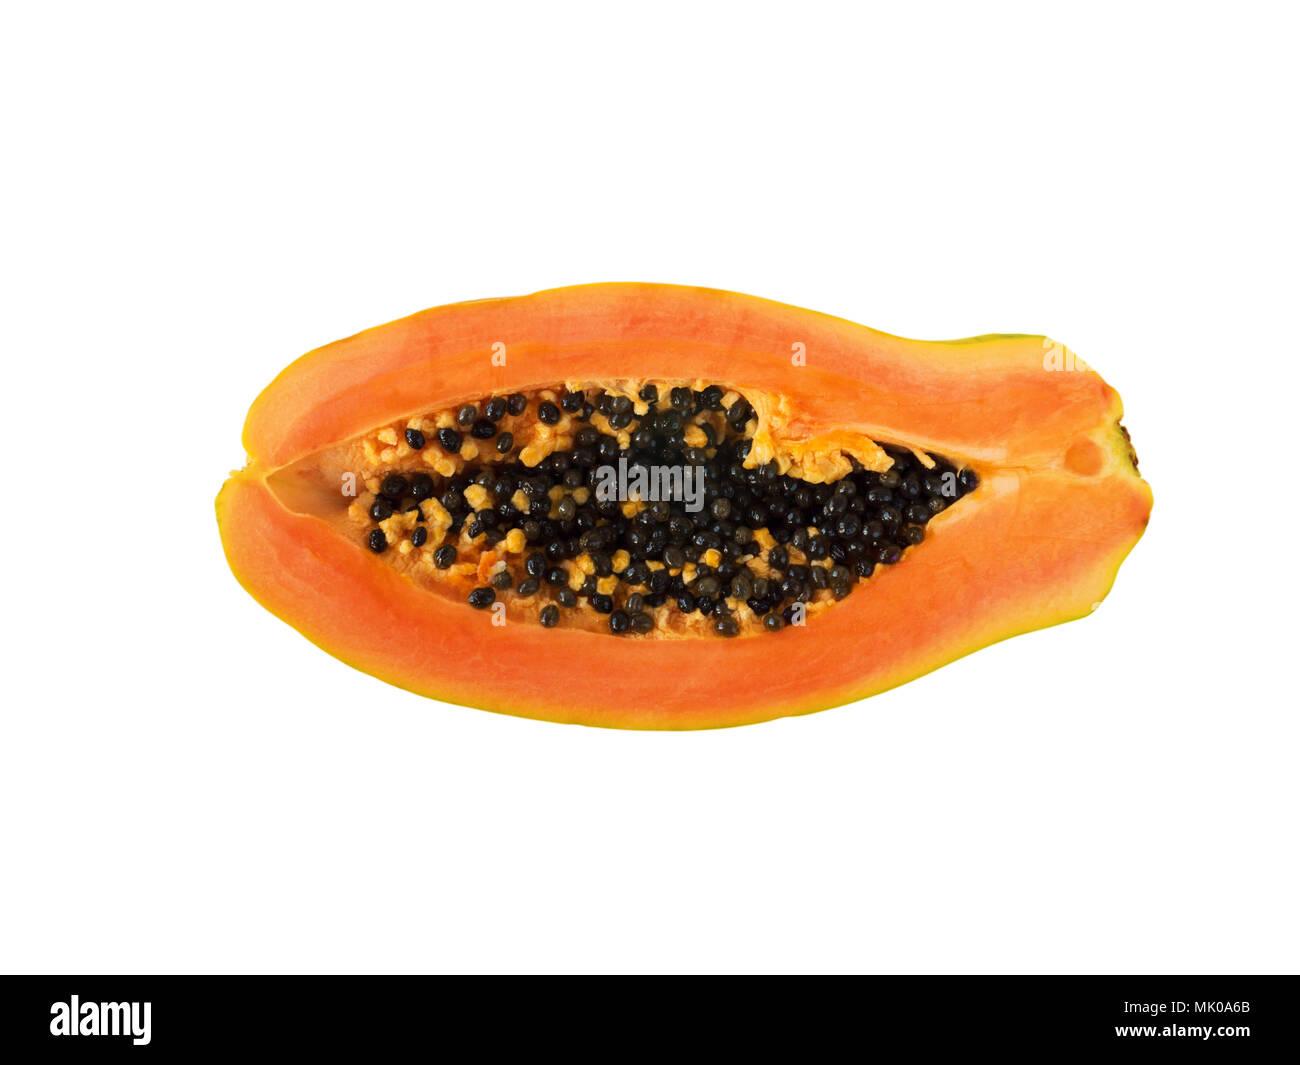 Ripe orange papaya exotic fruit with black seeds half cut top view flat lay isolated on white - Stock Image